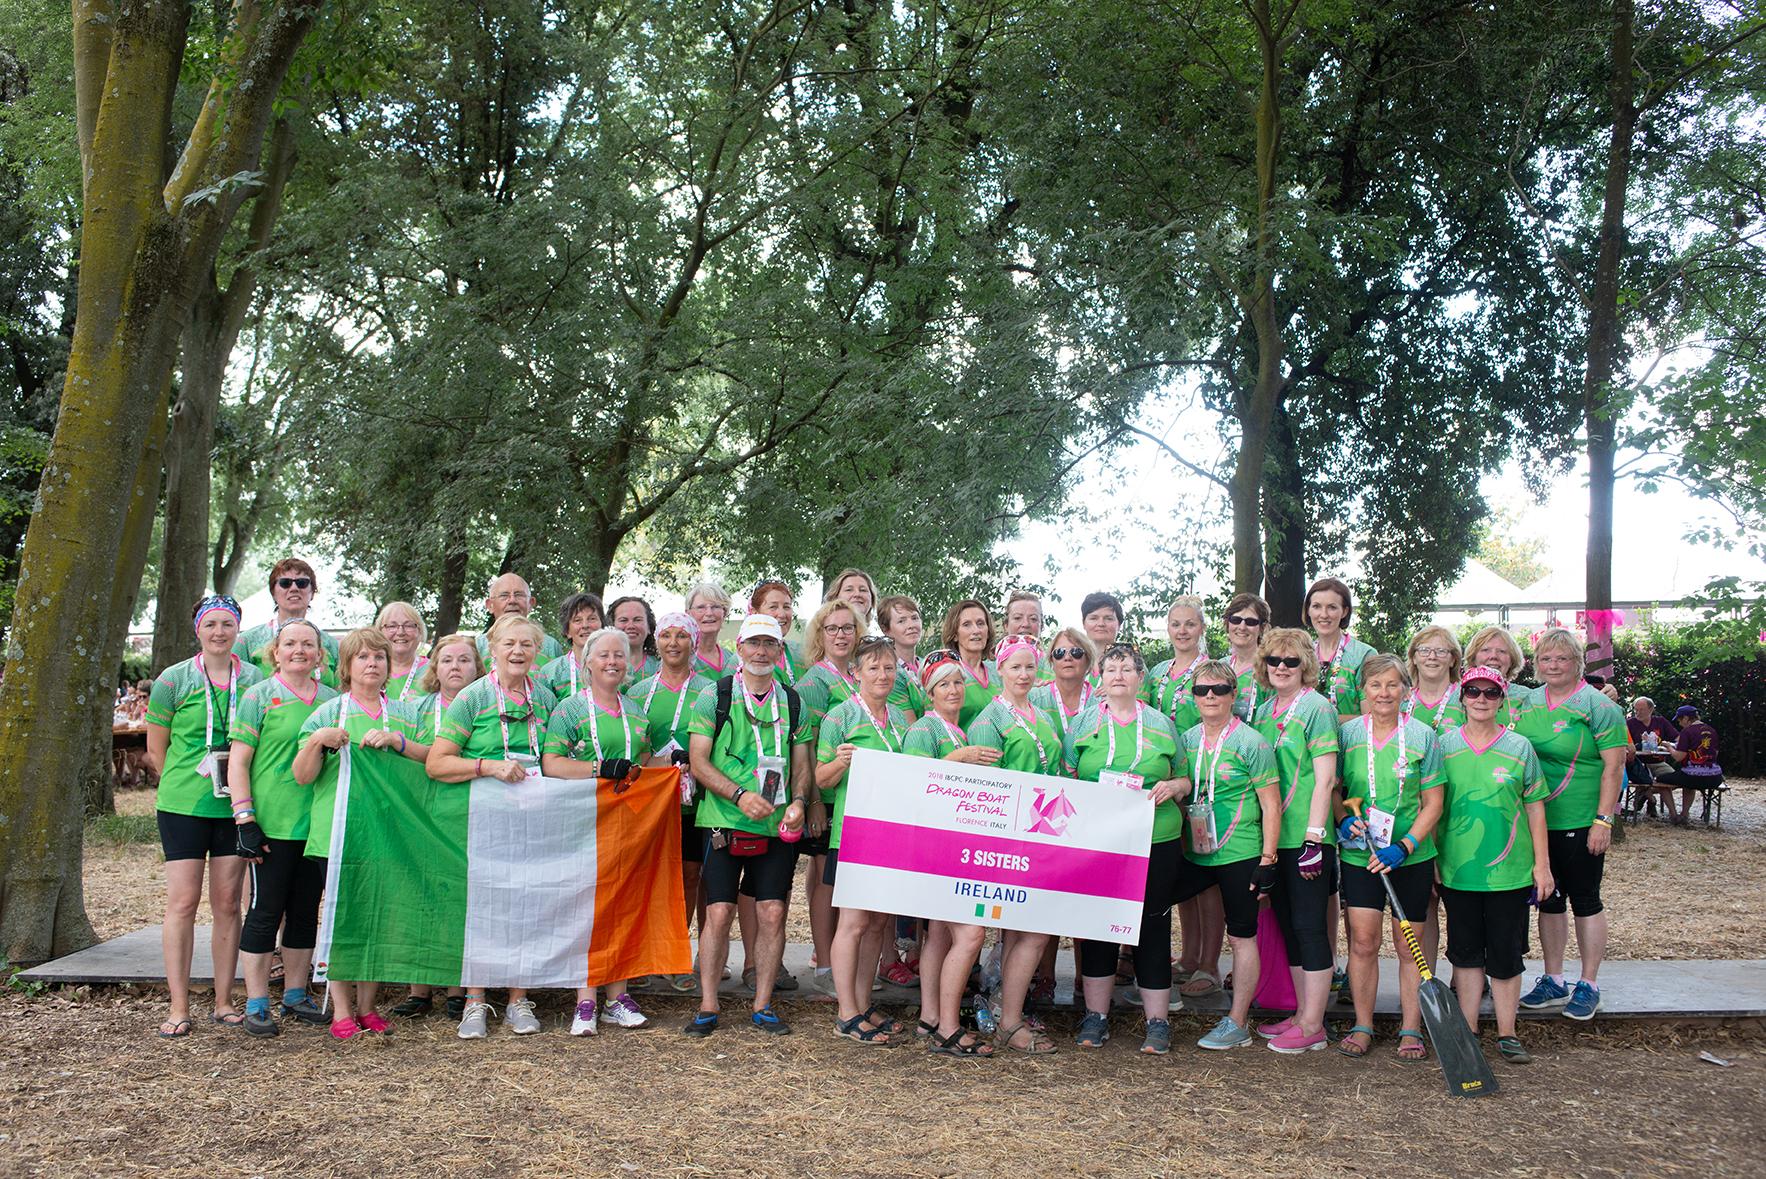 3 Sister - Ireland